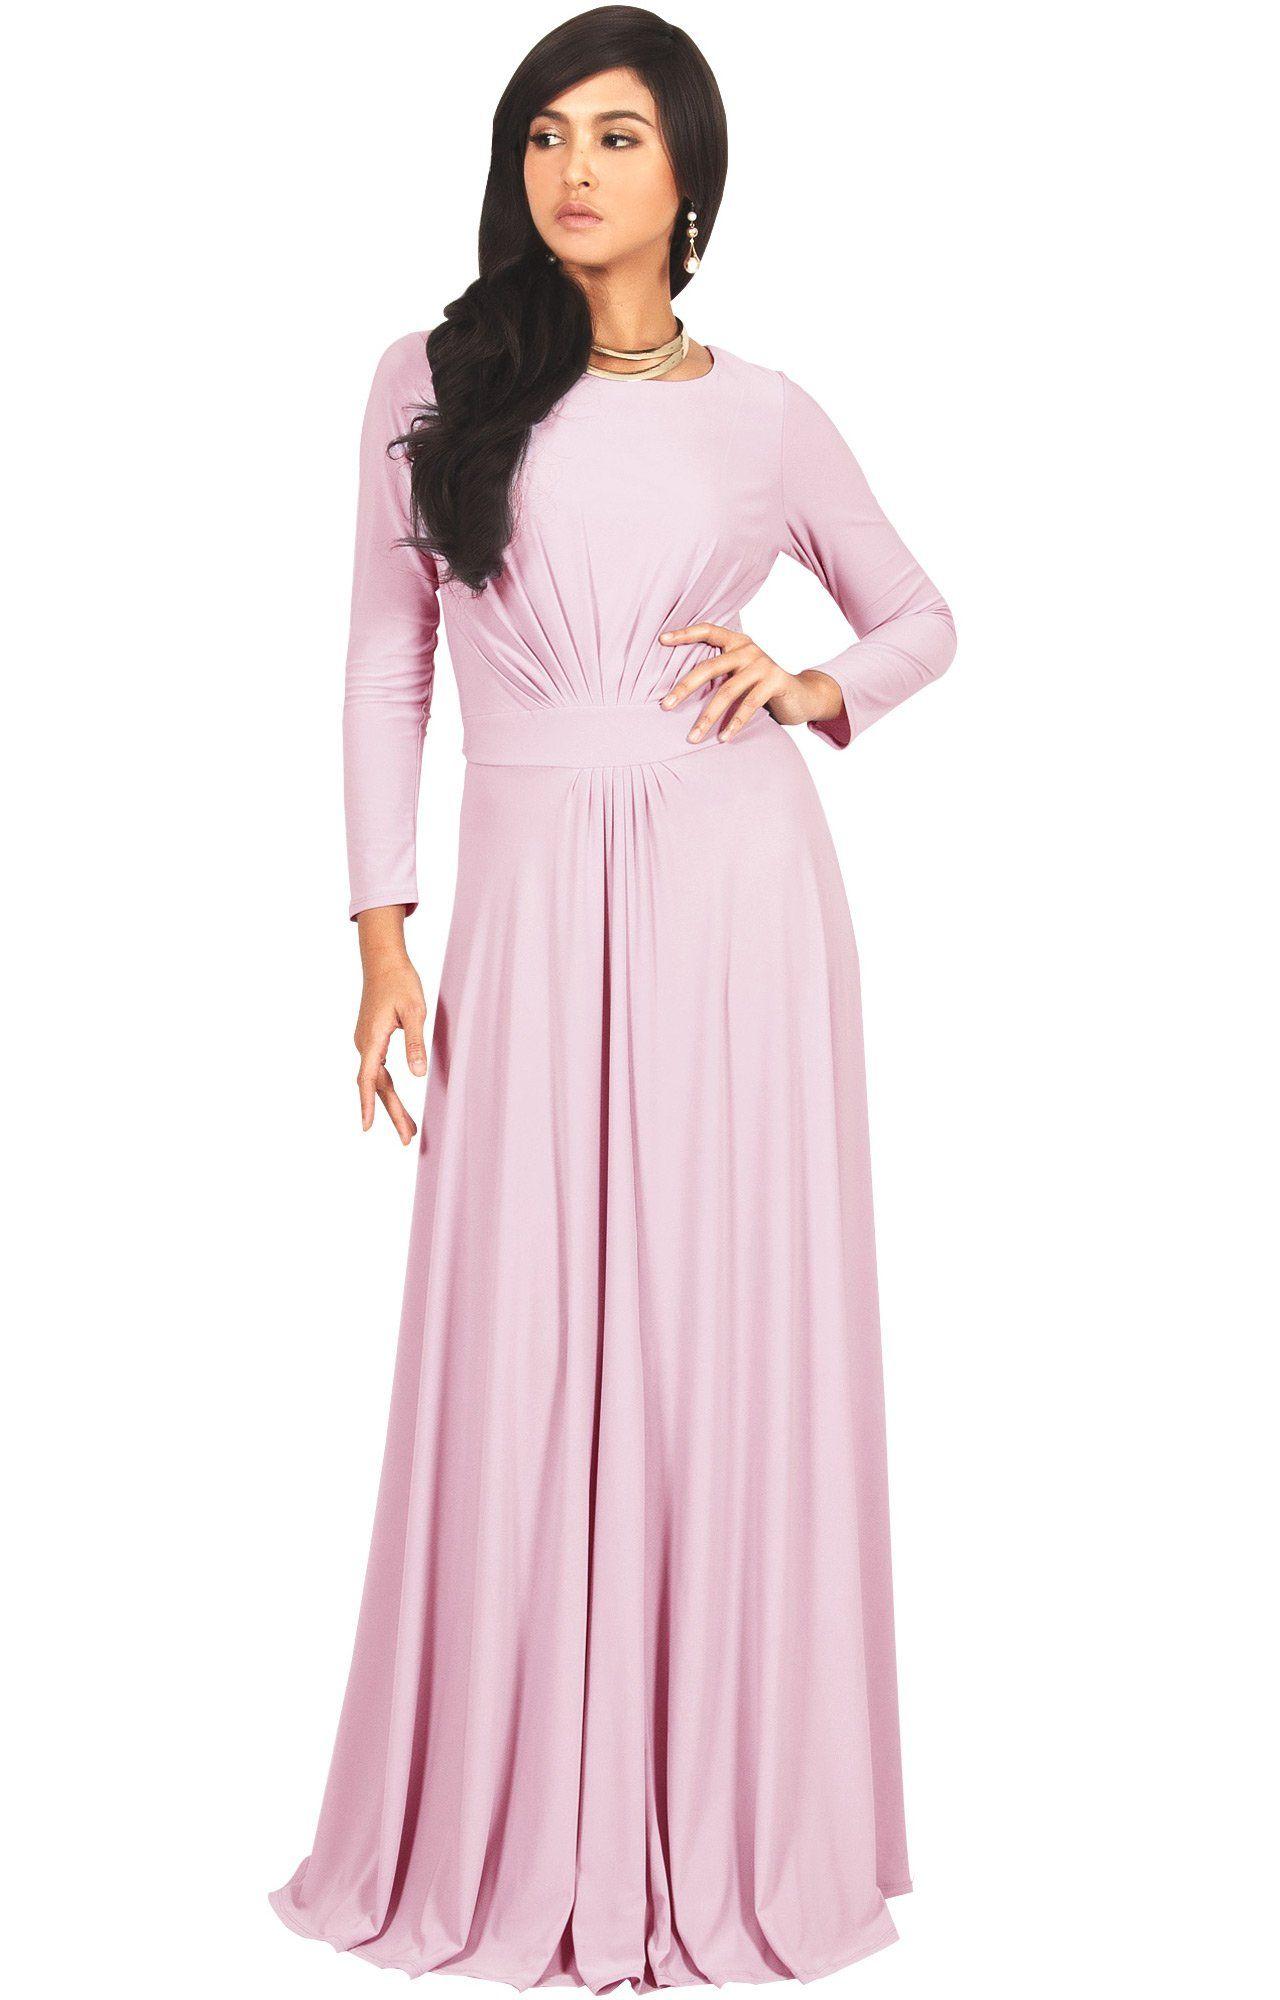 bb2a05d2834c0 Maternity Outfits - loose-fitting maternity maxi dress : KOH KOH Petite  Womens Long Full